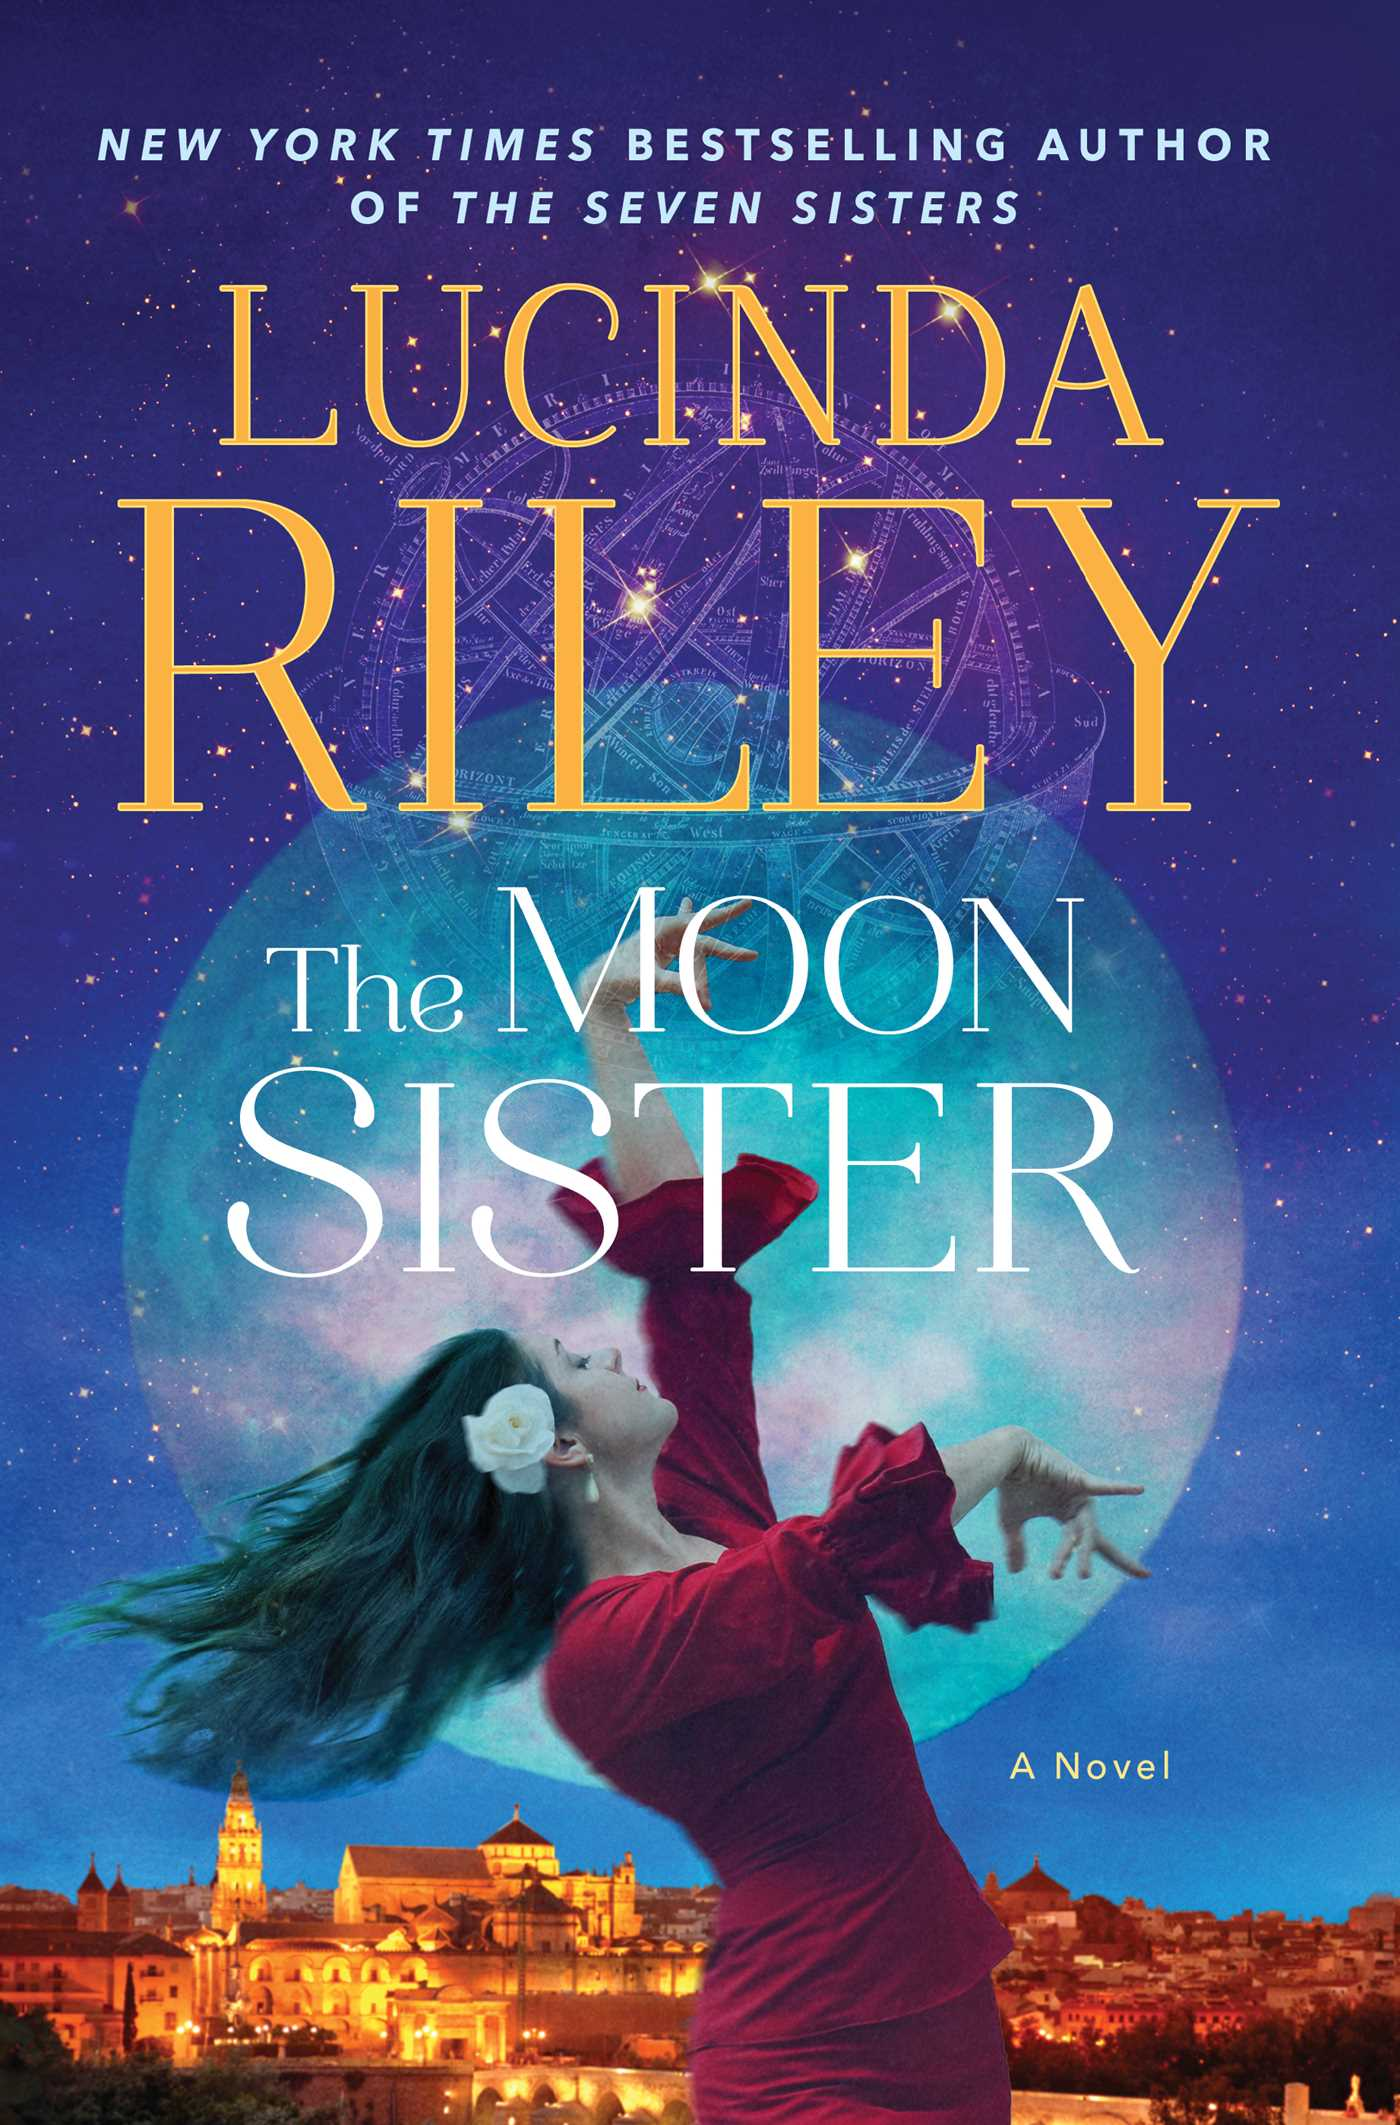 The moon sister 9781982110611 hr